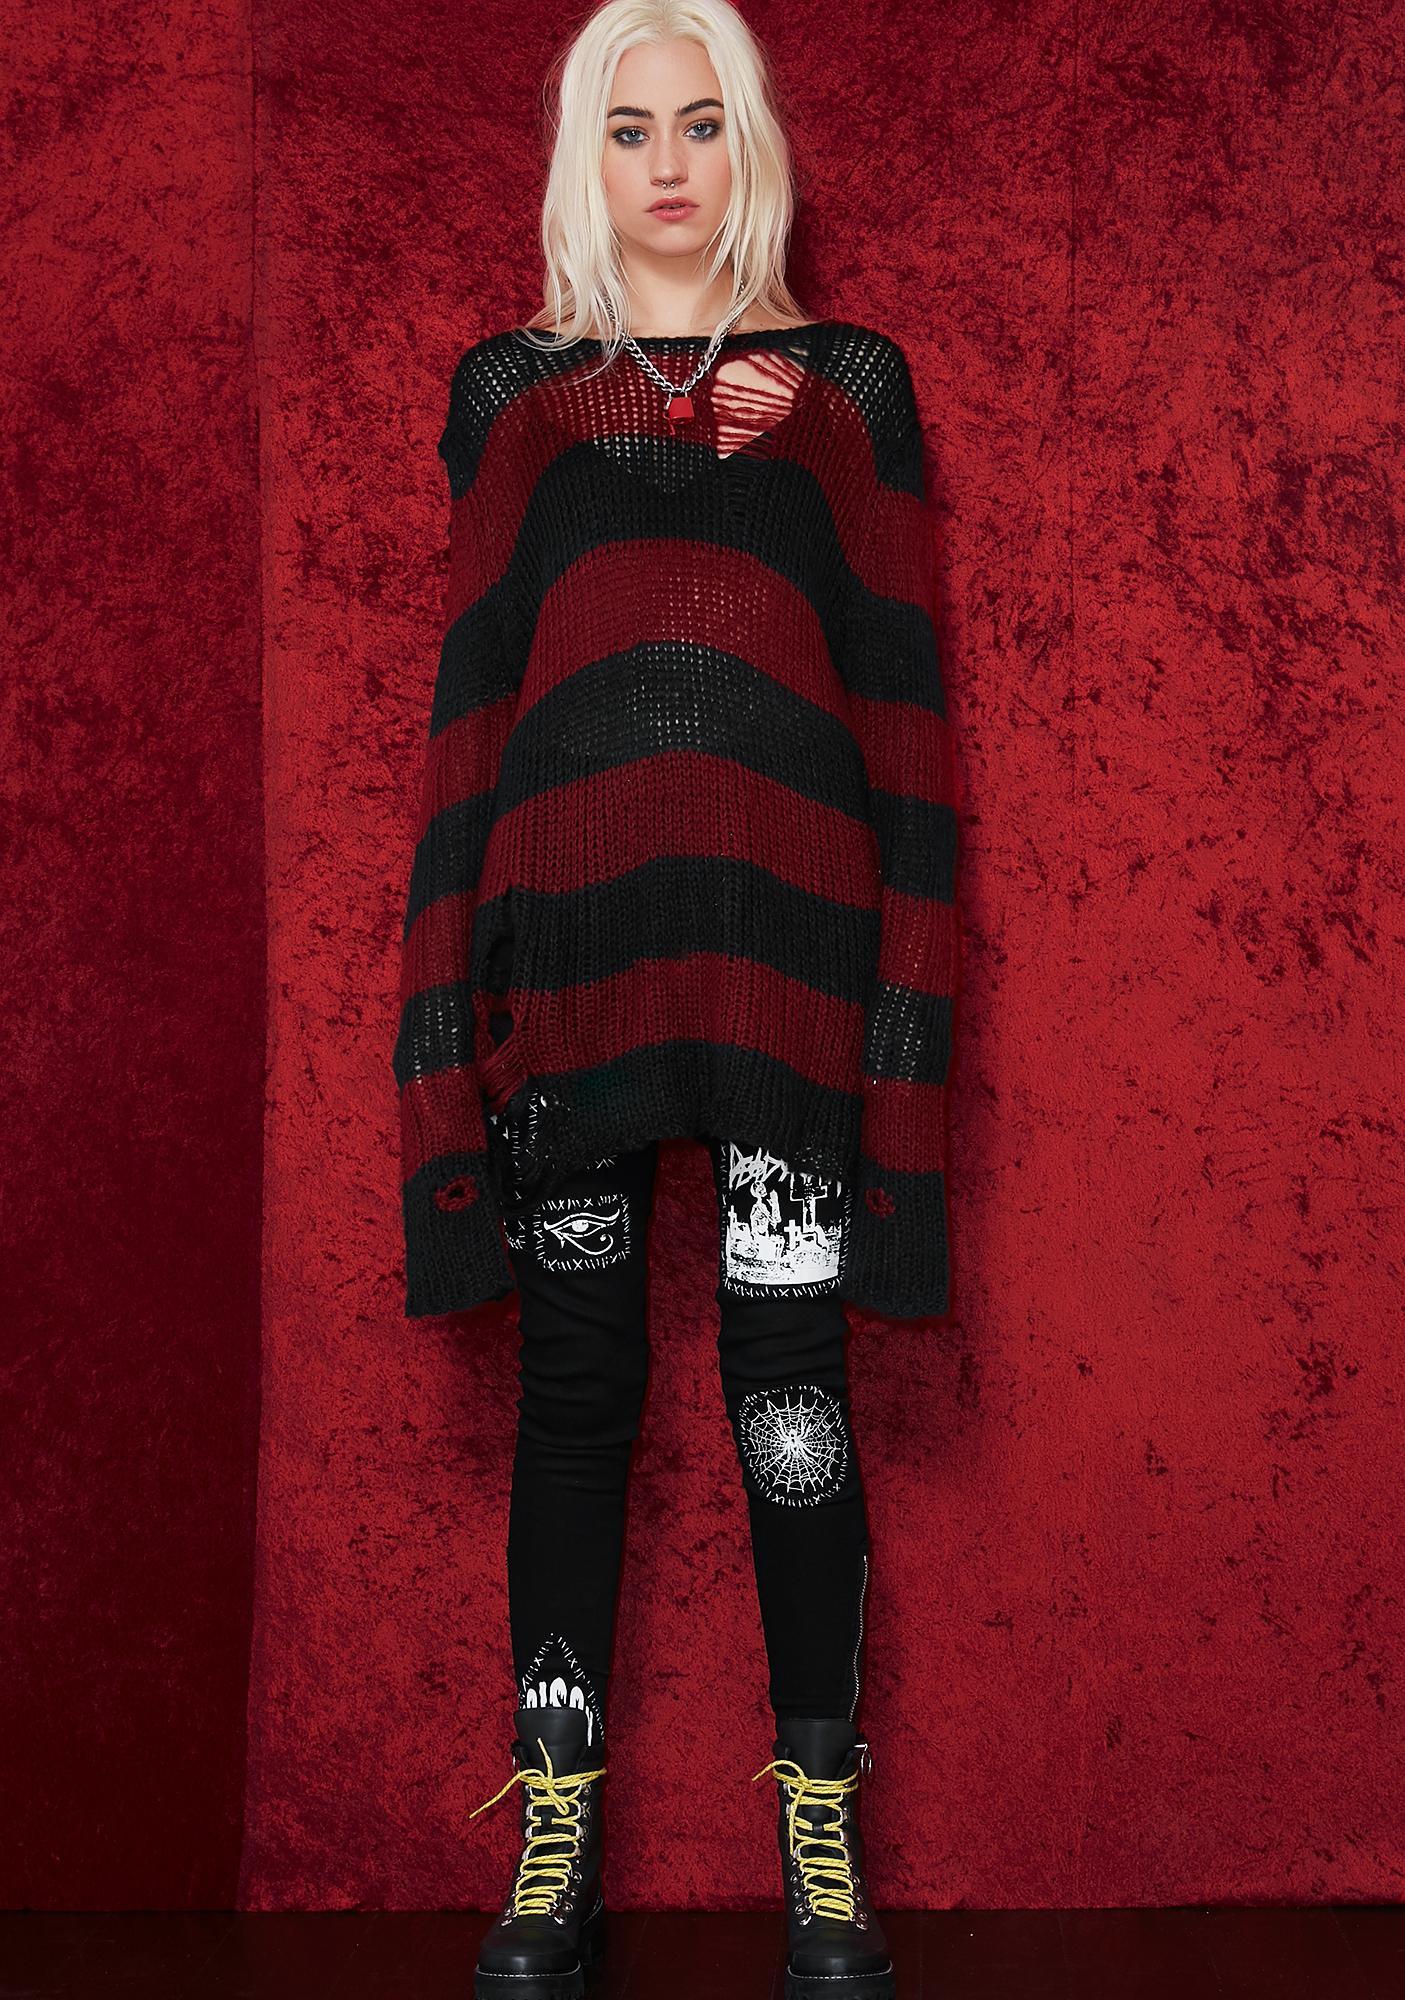 de12ac41273e Current Mood Striped Distressed Sweater